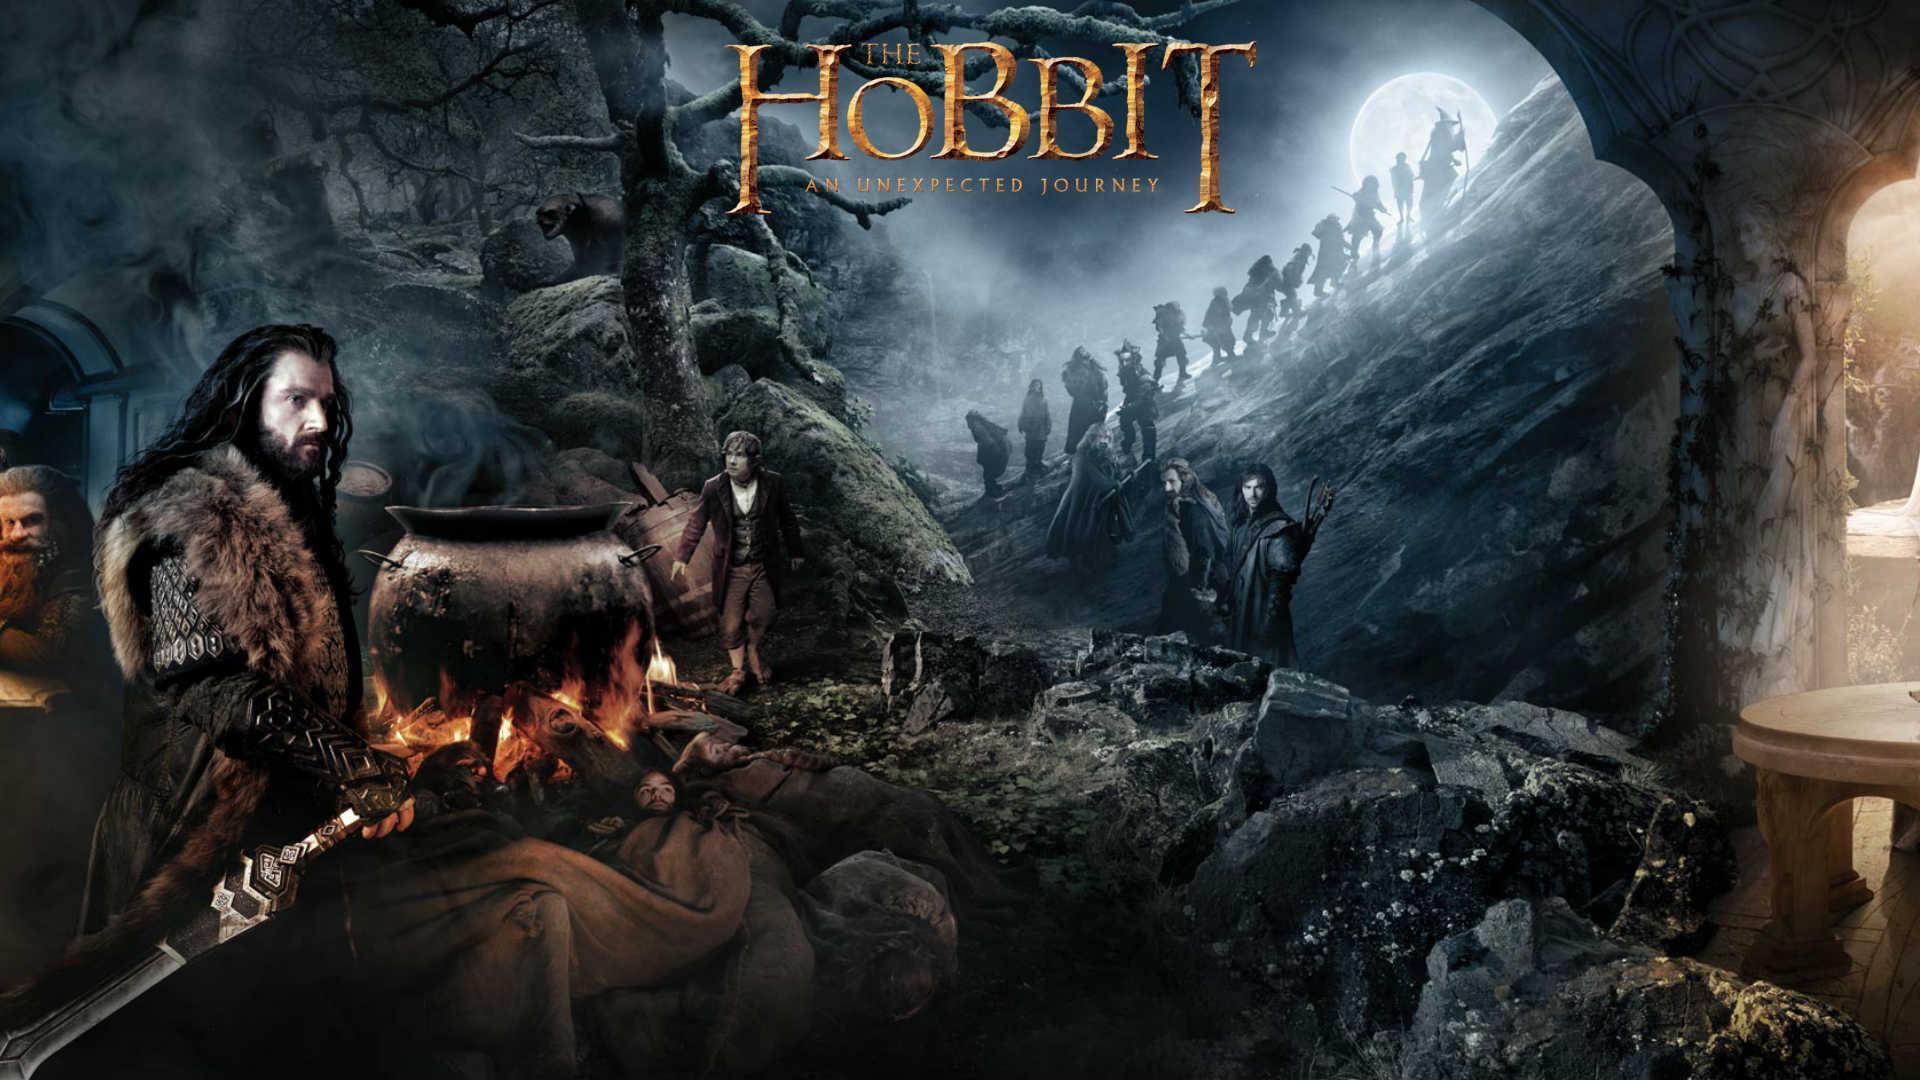 The Hobbit Wallpapers HD Wallpapers 1920x1080